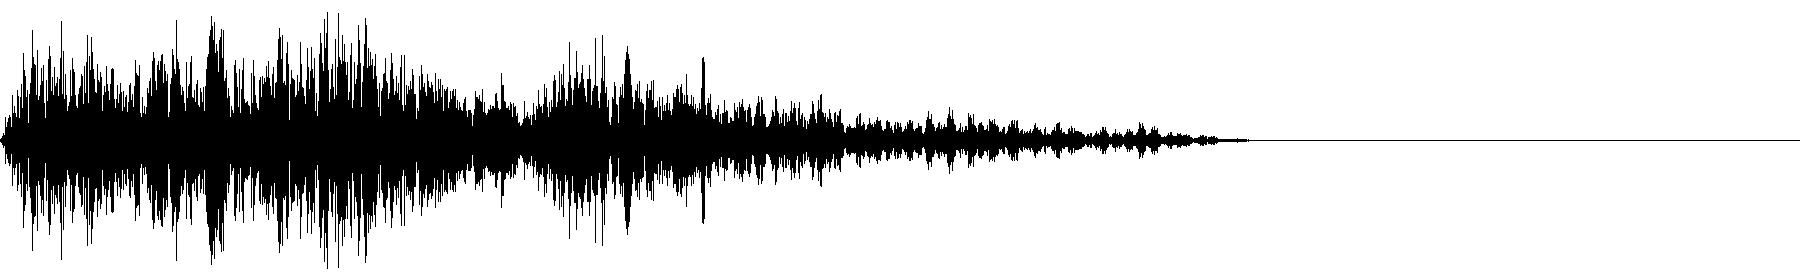 vox 003